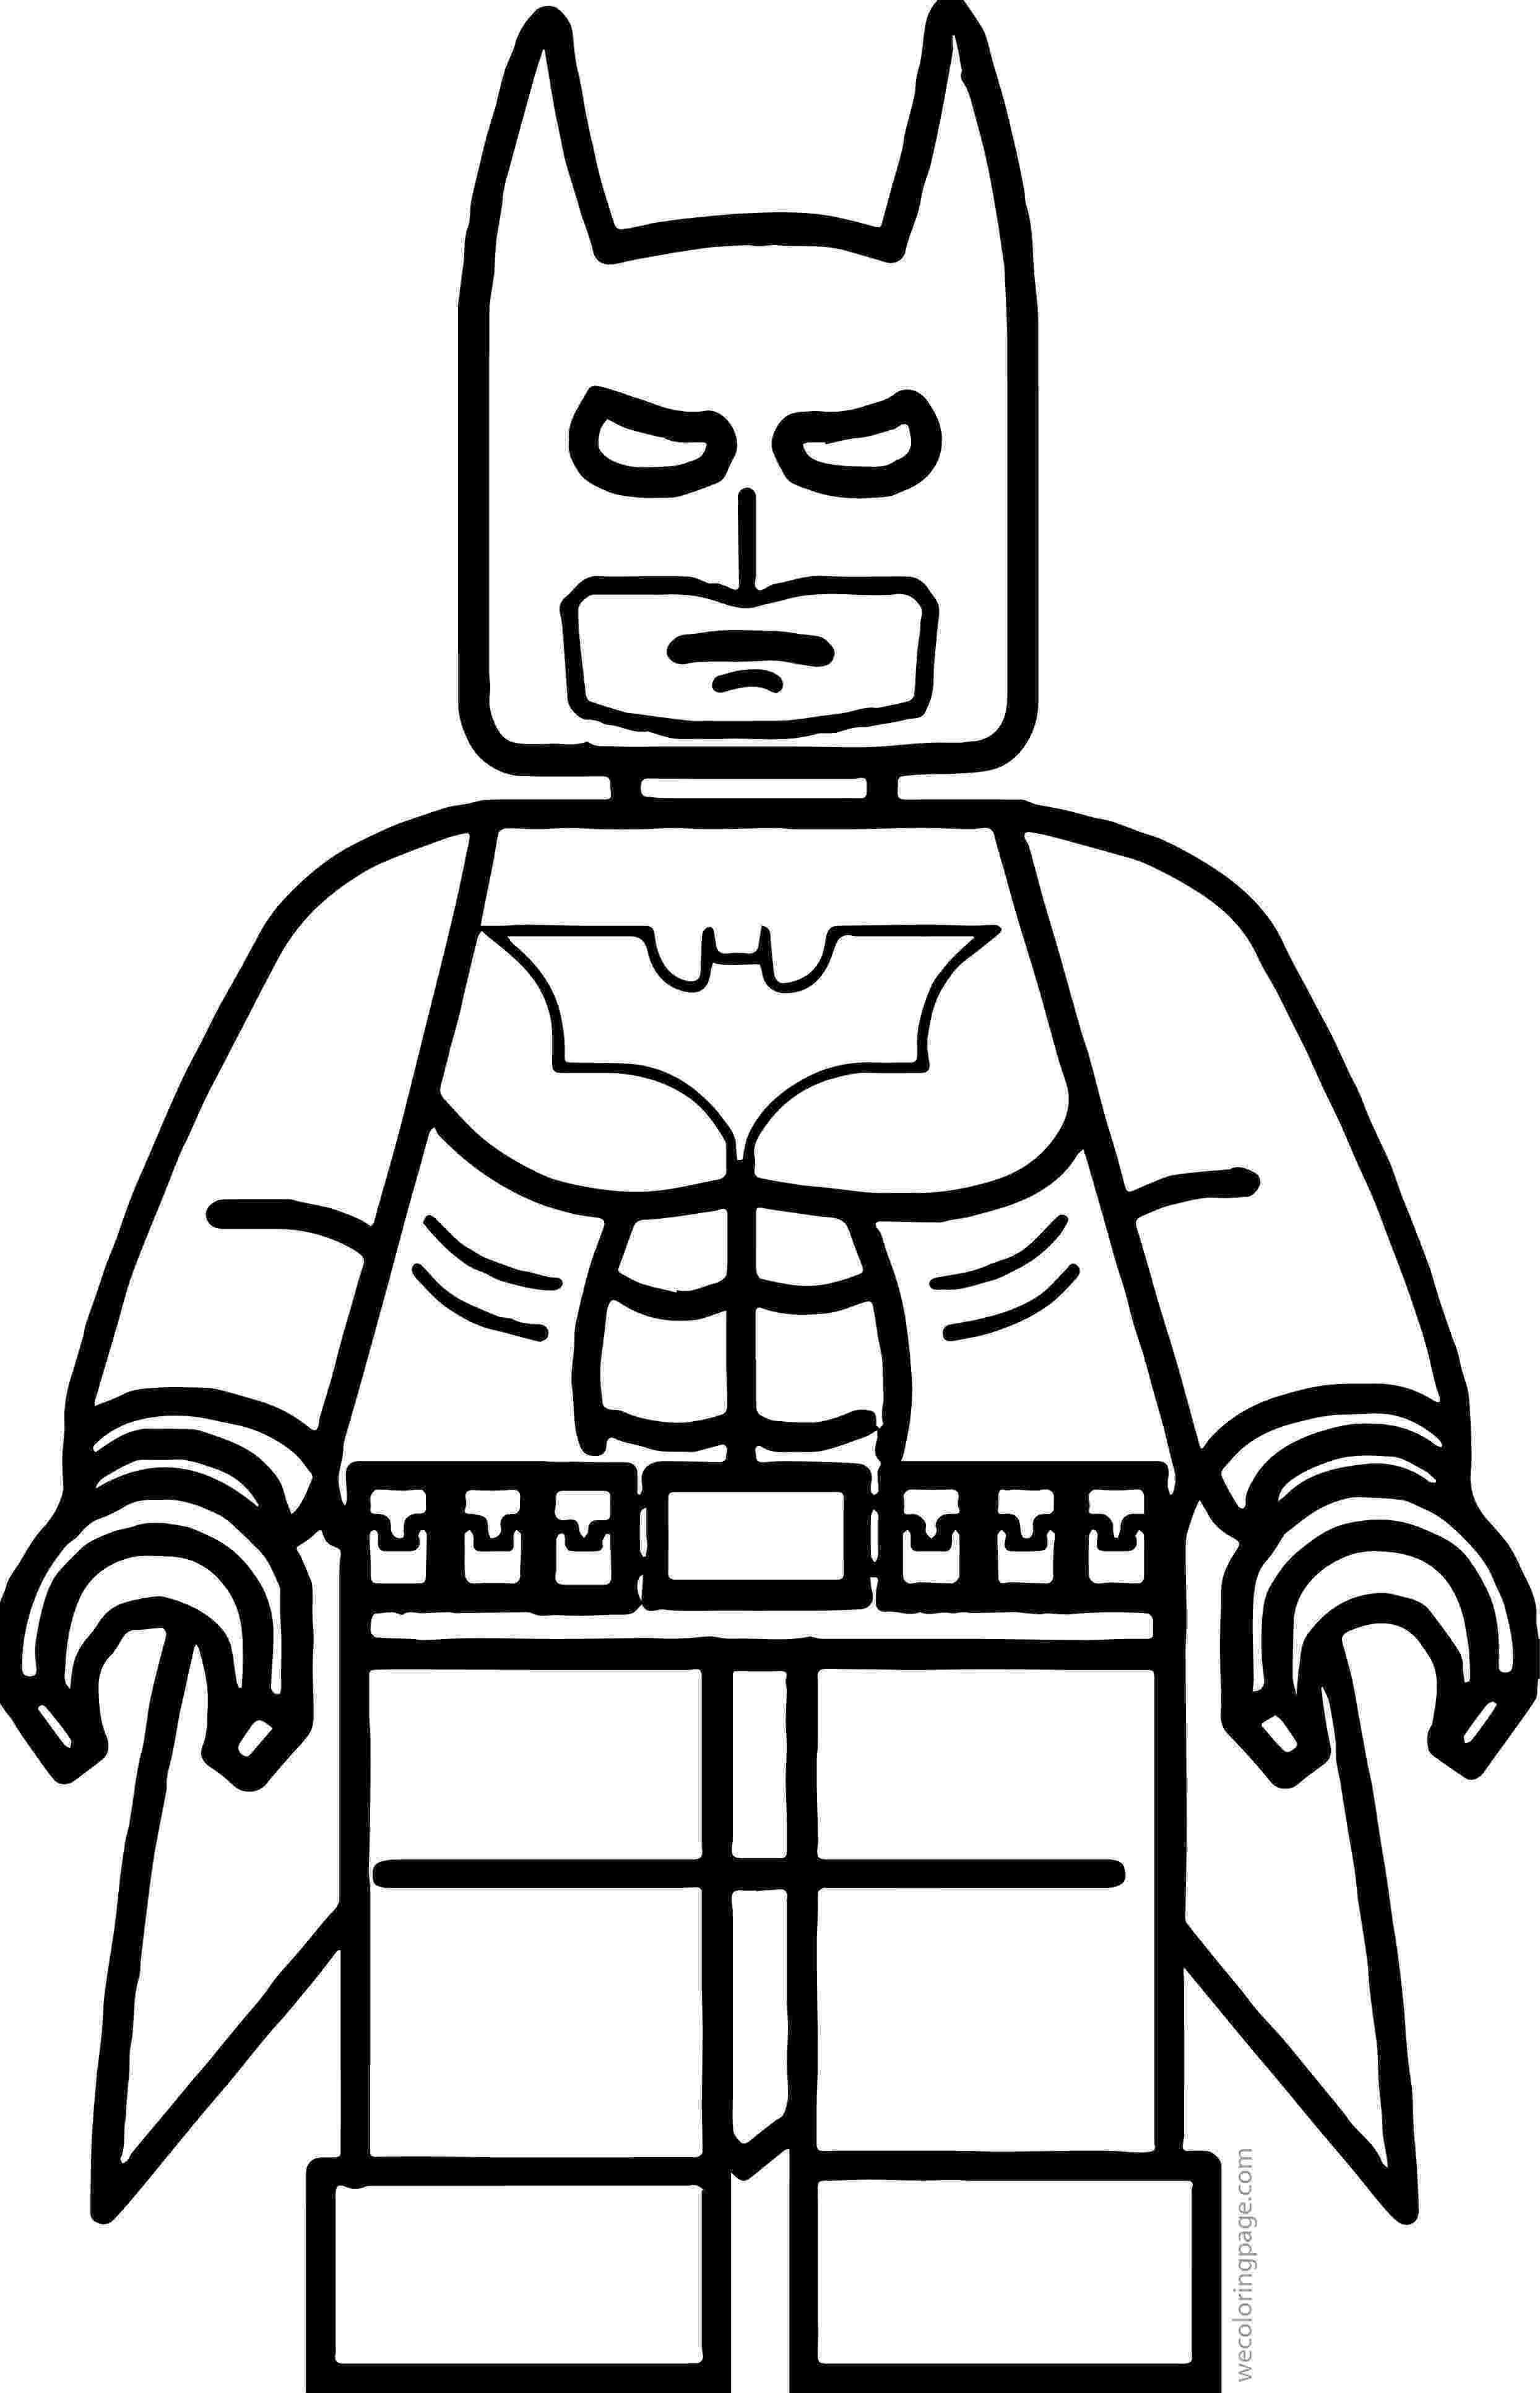 lego man coloring pages lego batman coloring page rock art batman coloring lego coloring man pages